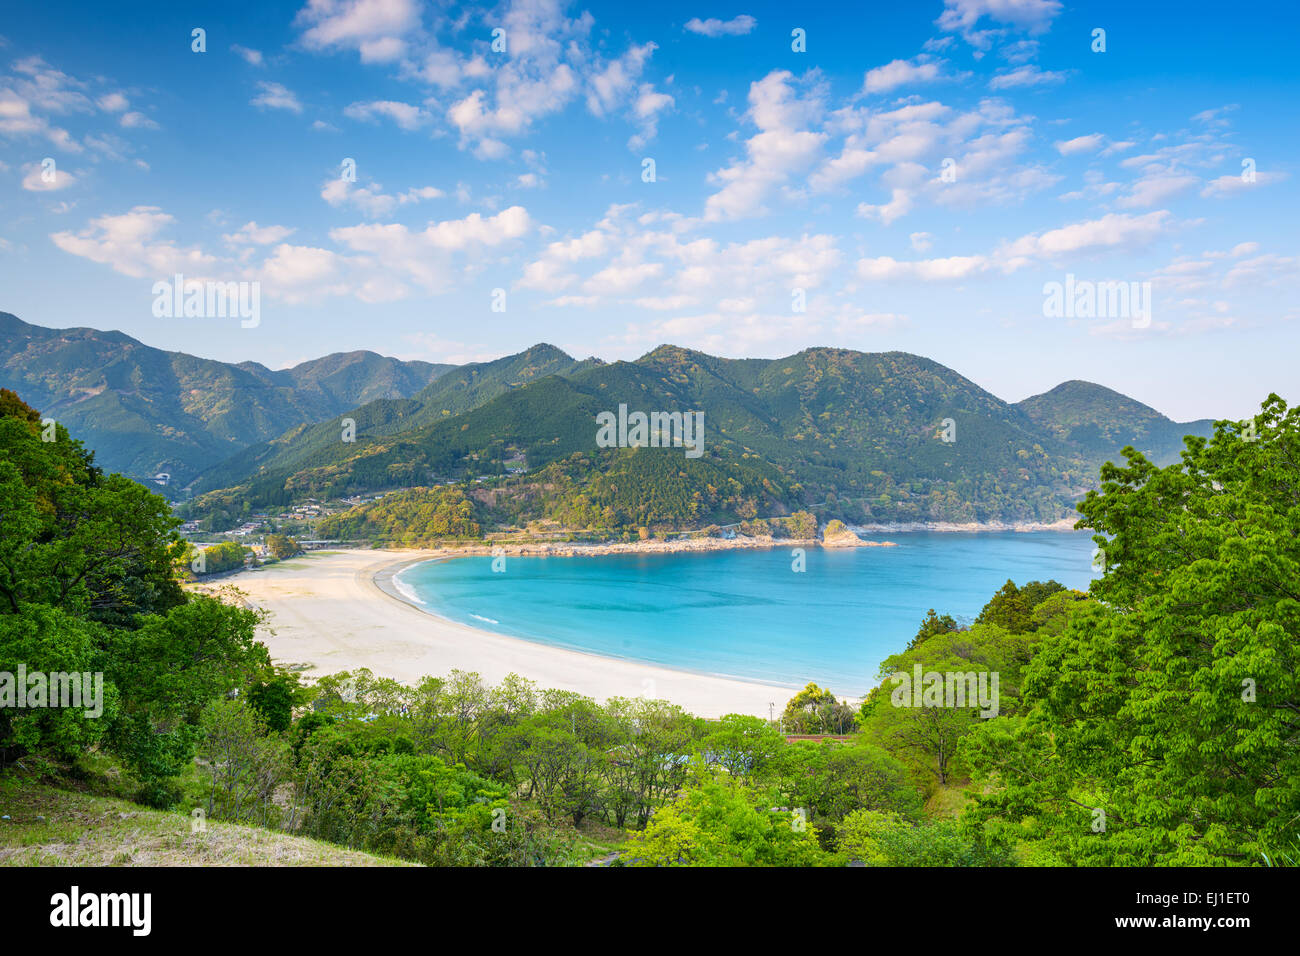 Atashika Beach in Kumano, Japan. - Stock Image